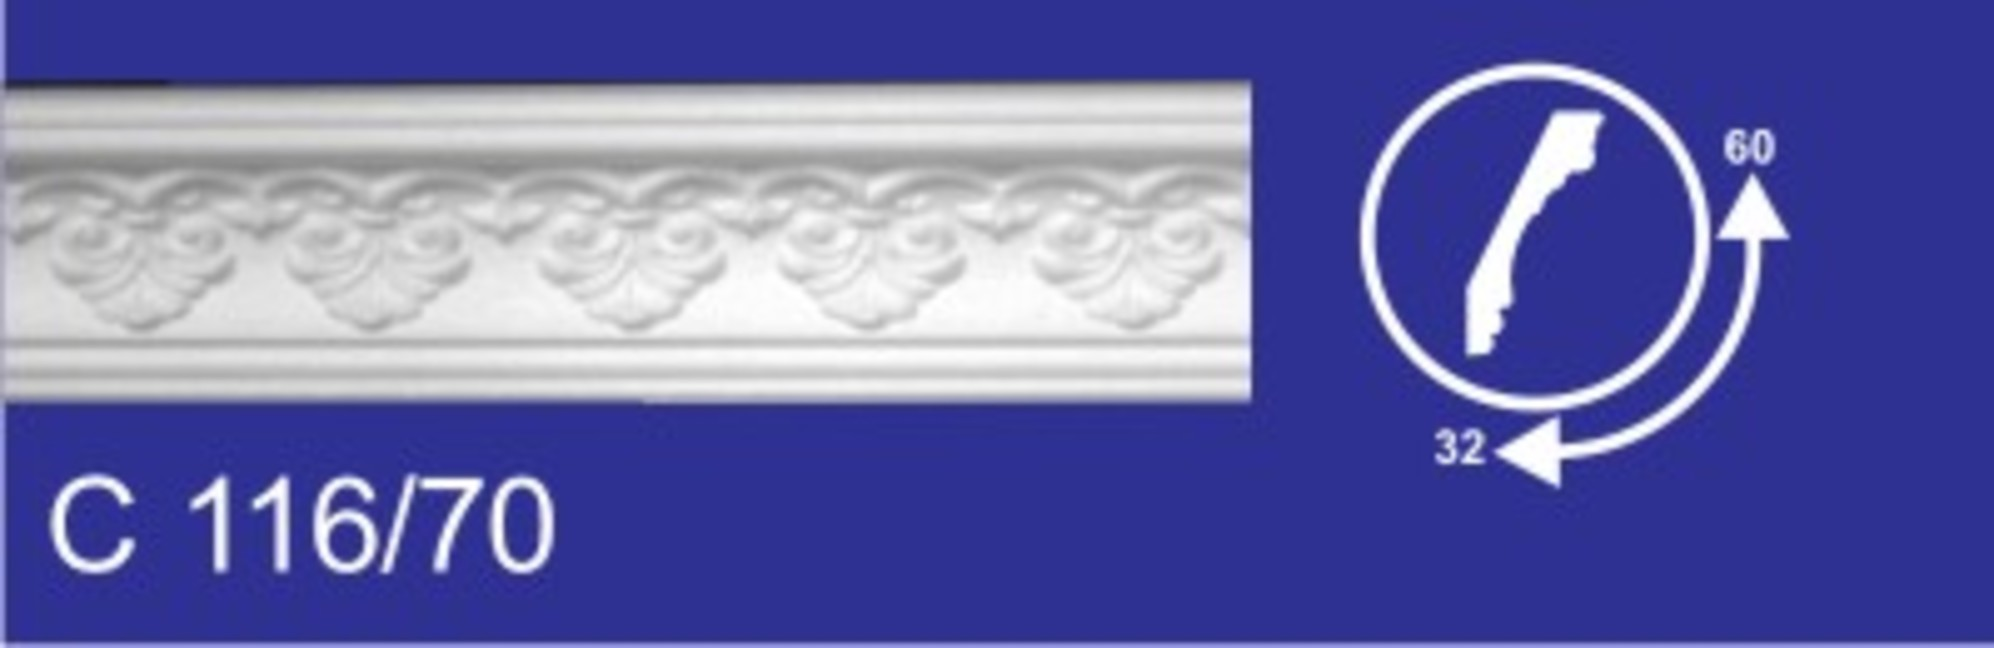 116/70/32*60*2000/Плинтус потолочный Wikibau1/50